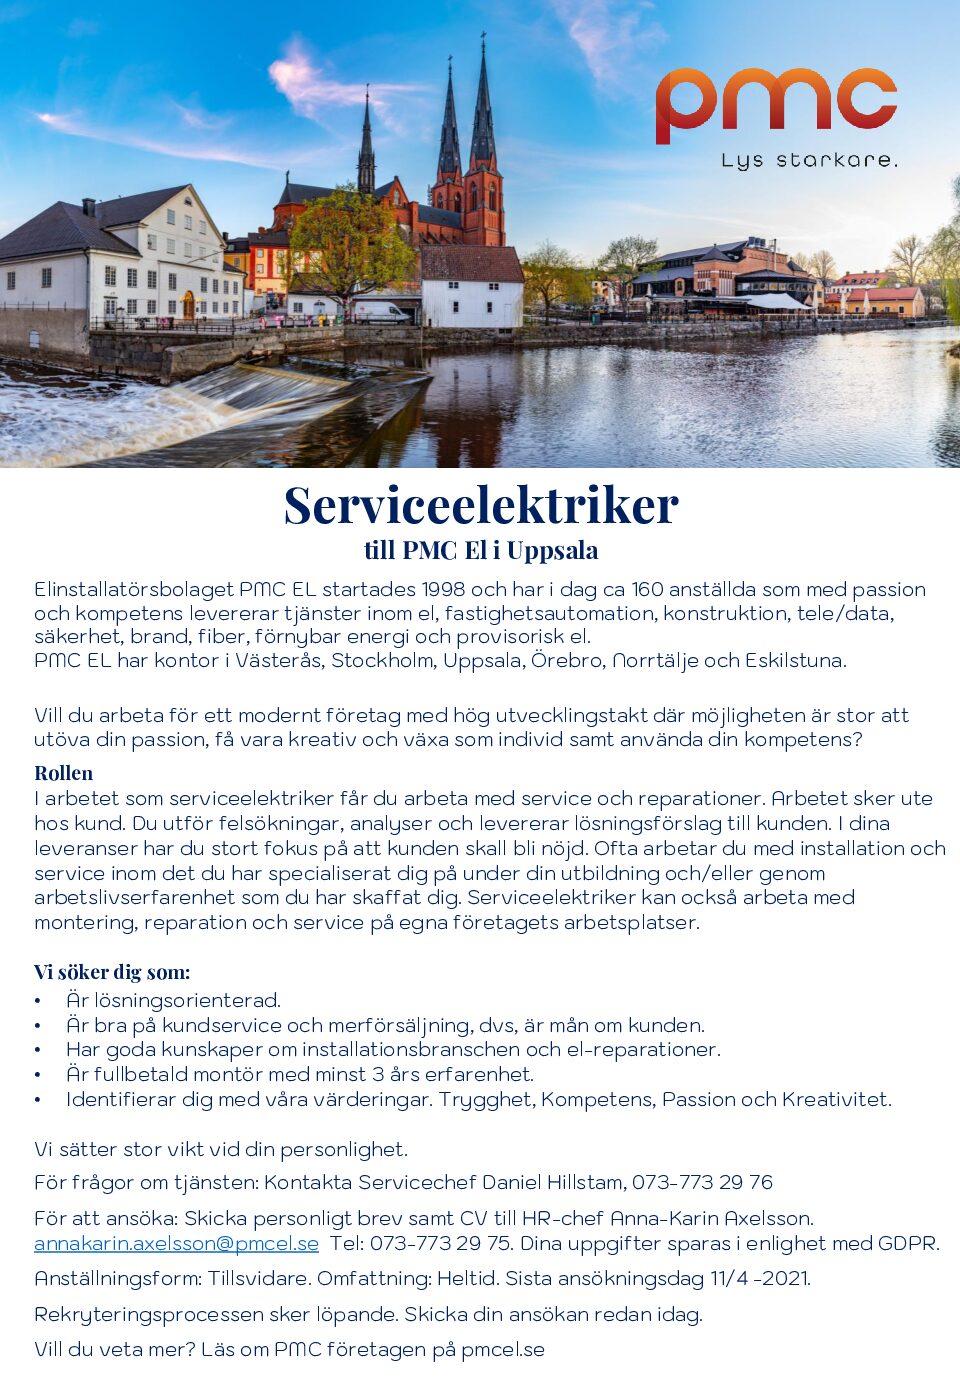 https://pmcel.se/wp-content/uploads/2021/03/Annons-Serviceelektriker-Uppsala-1.pdf